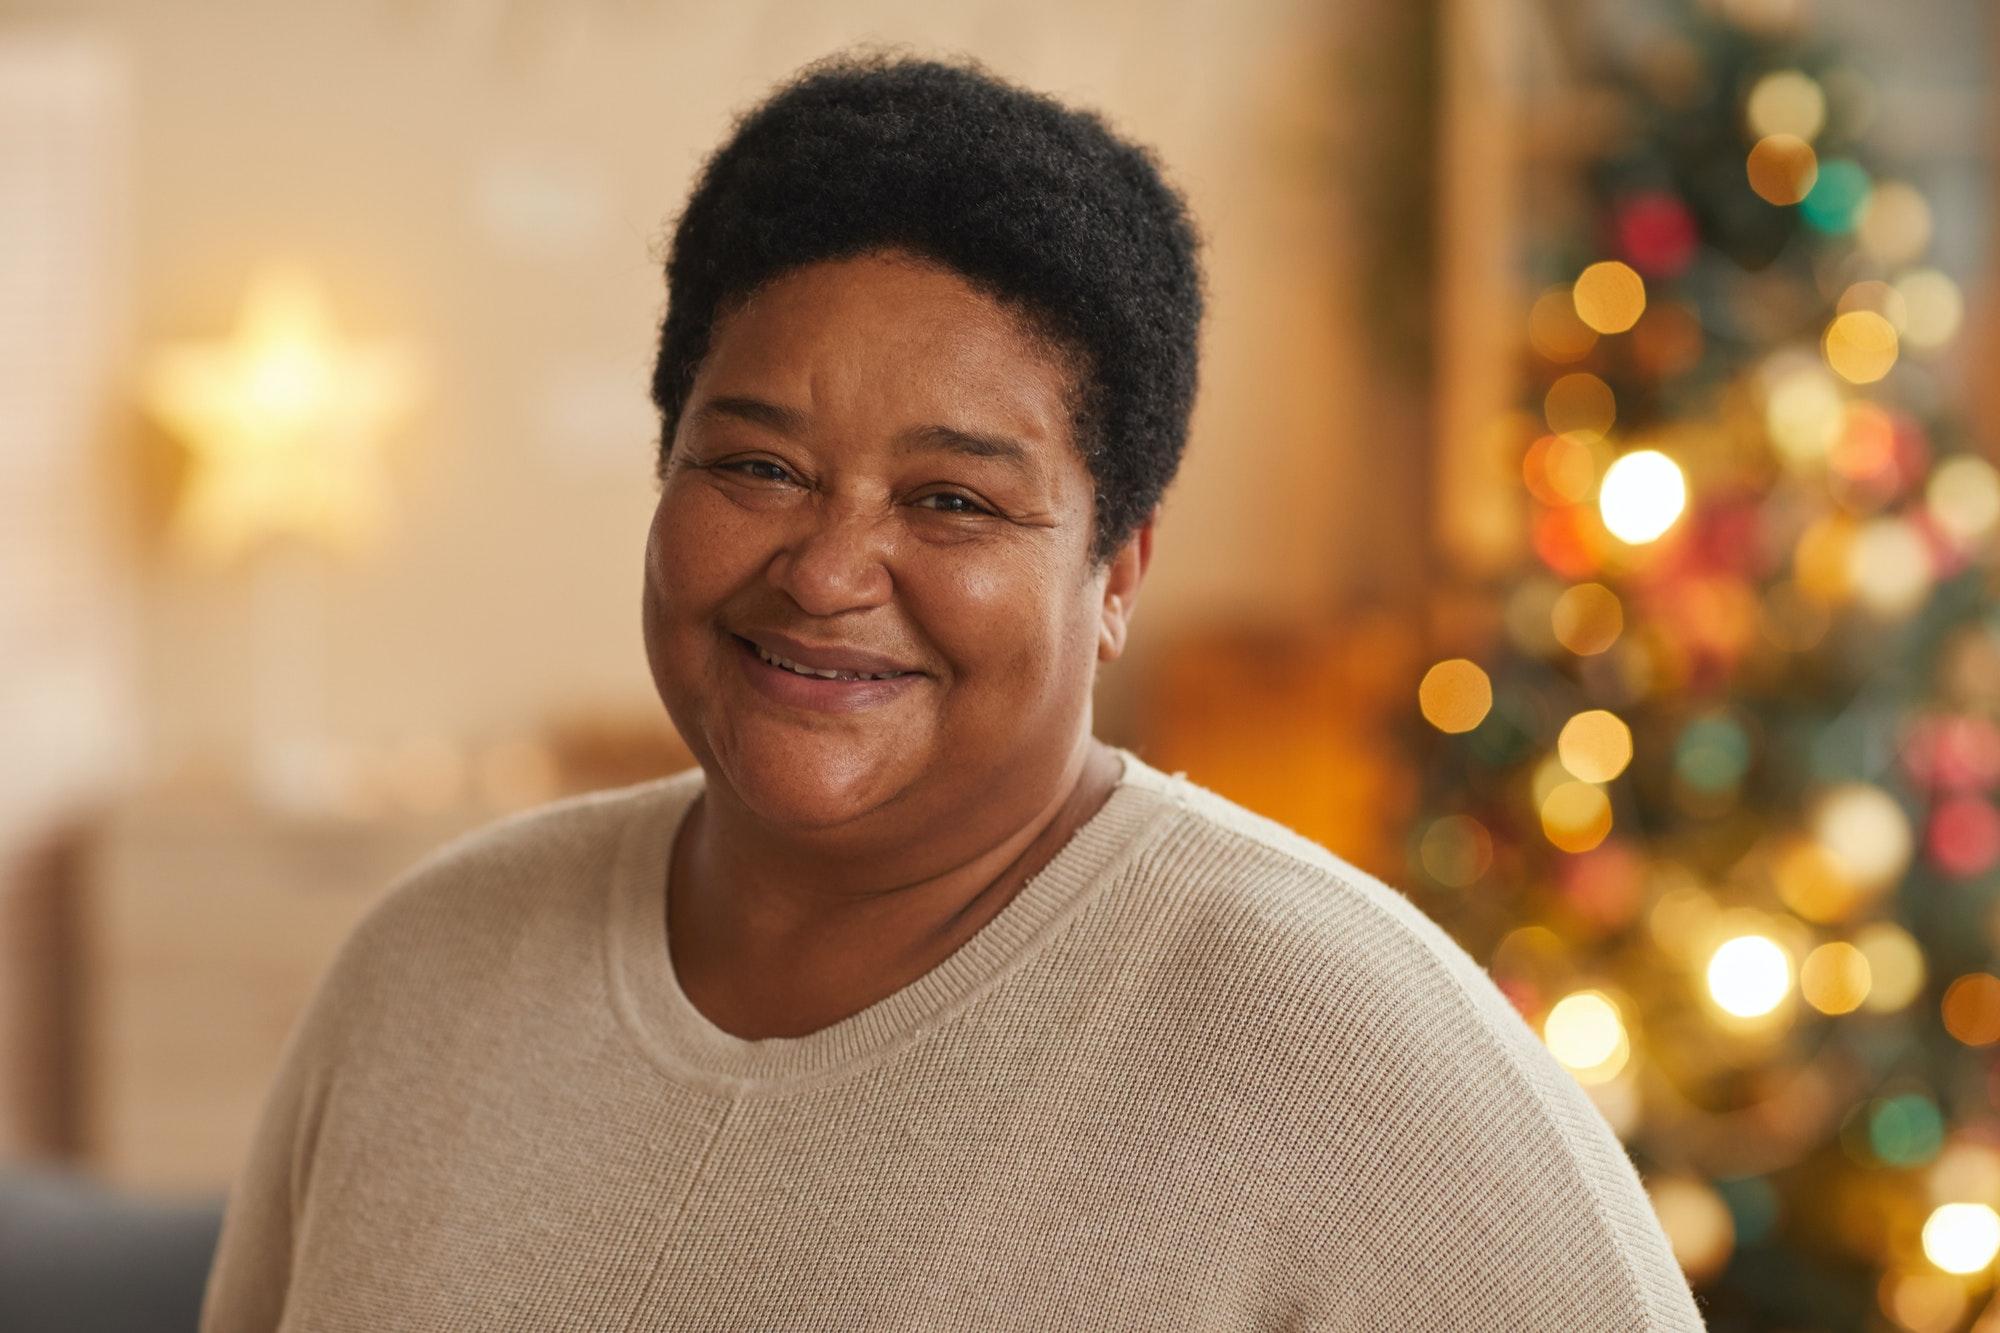 Senior African-American Woman on Christmas